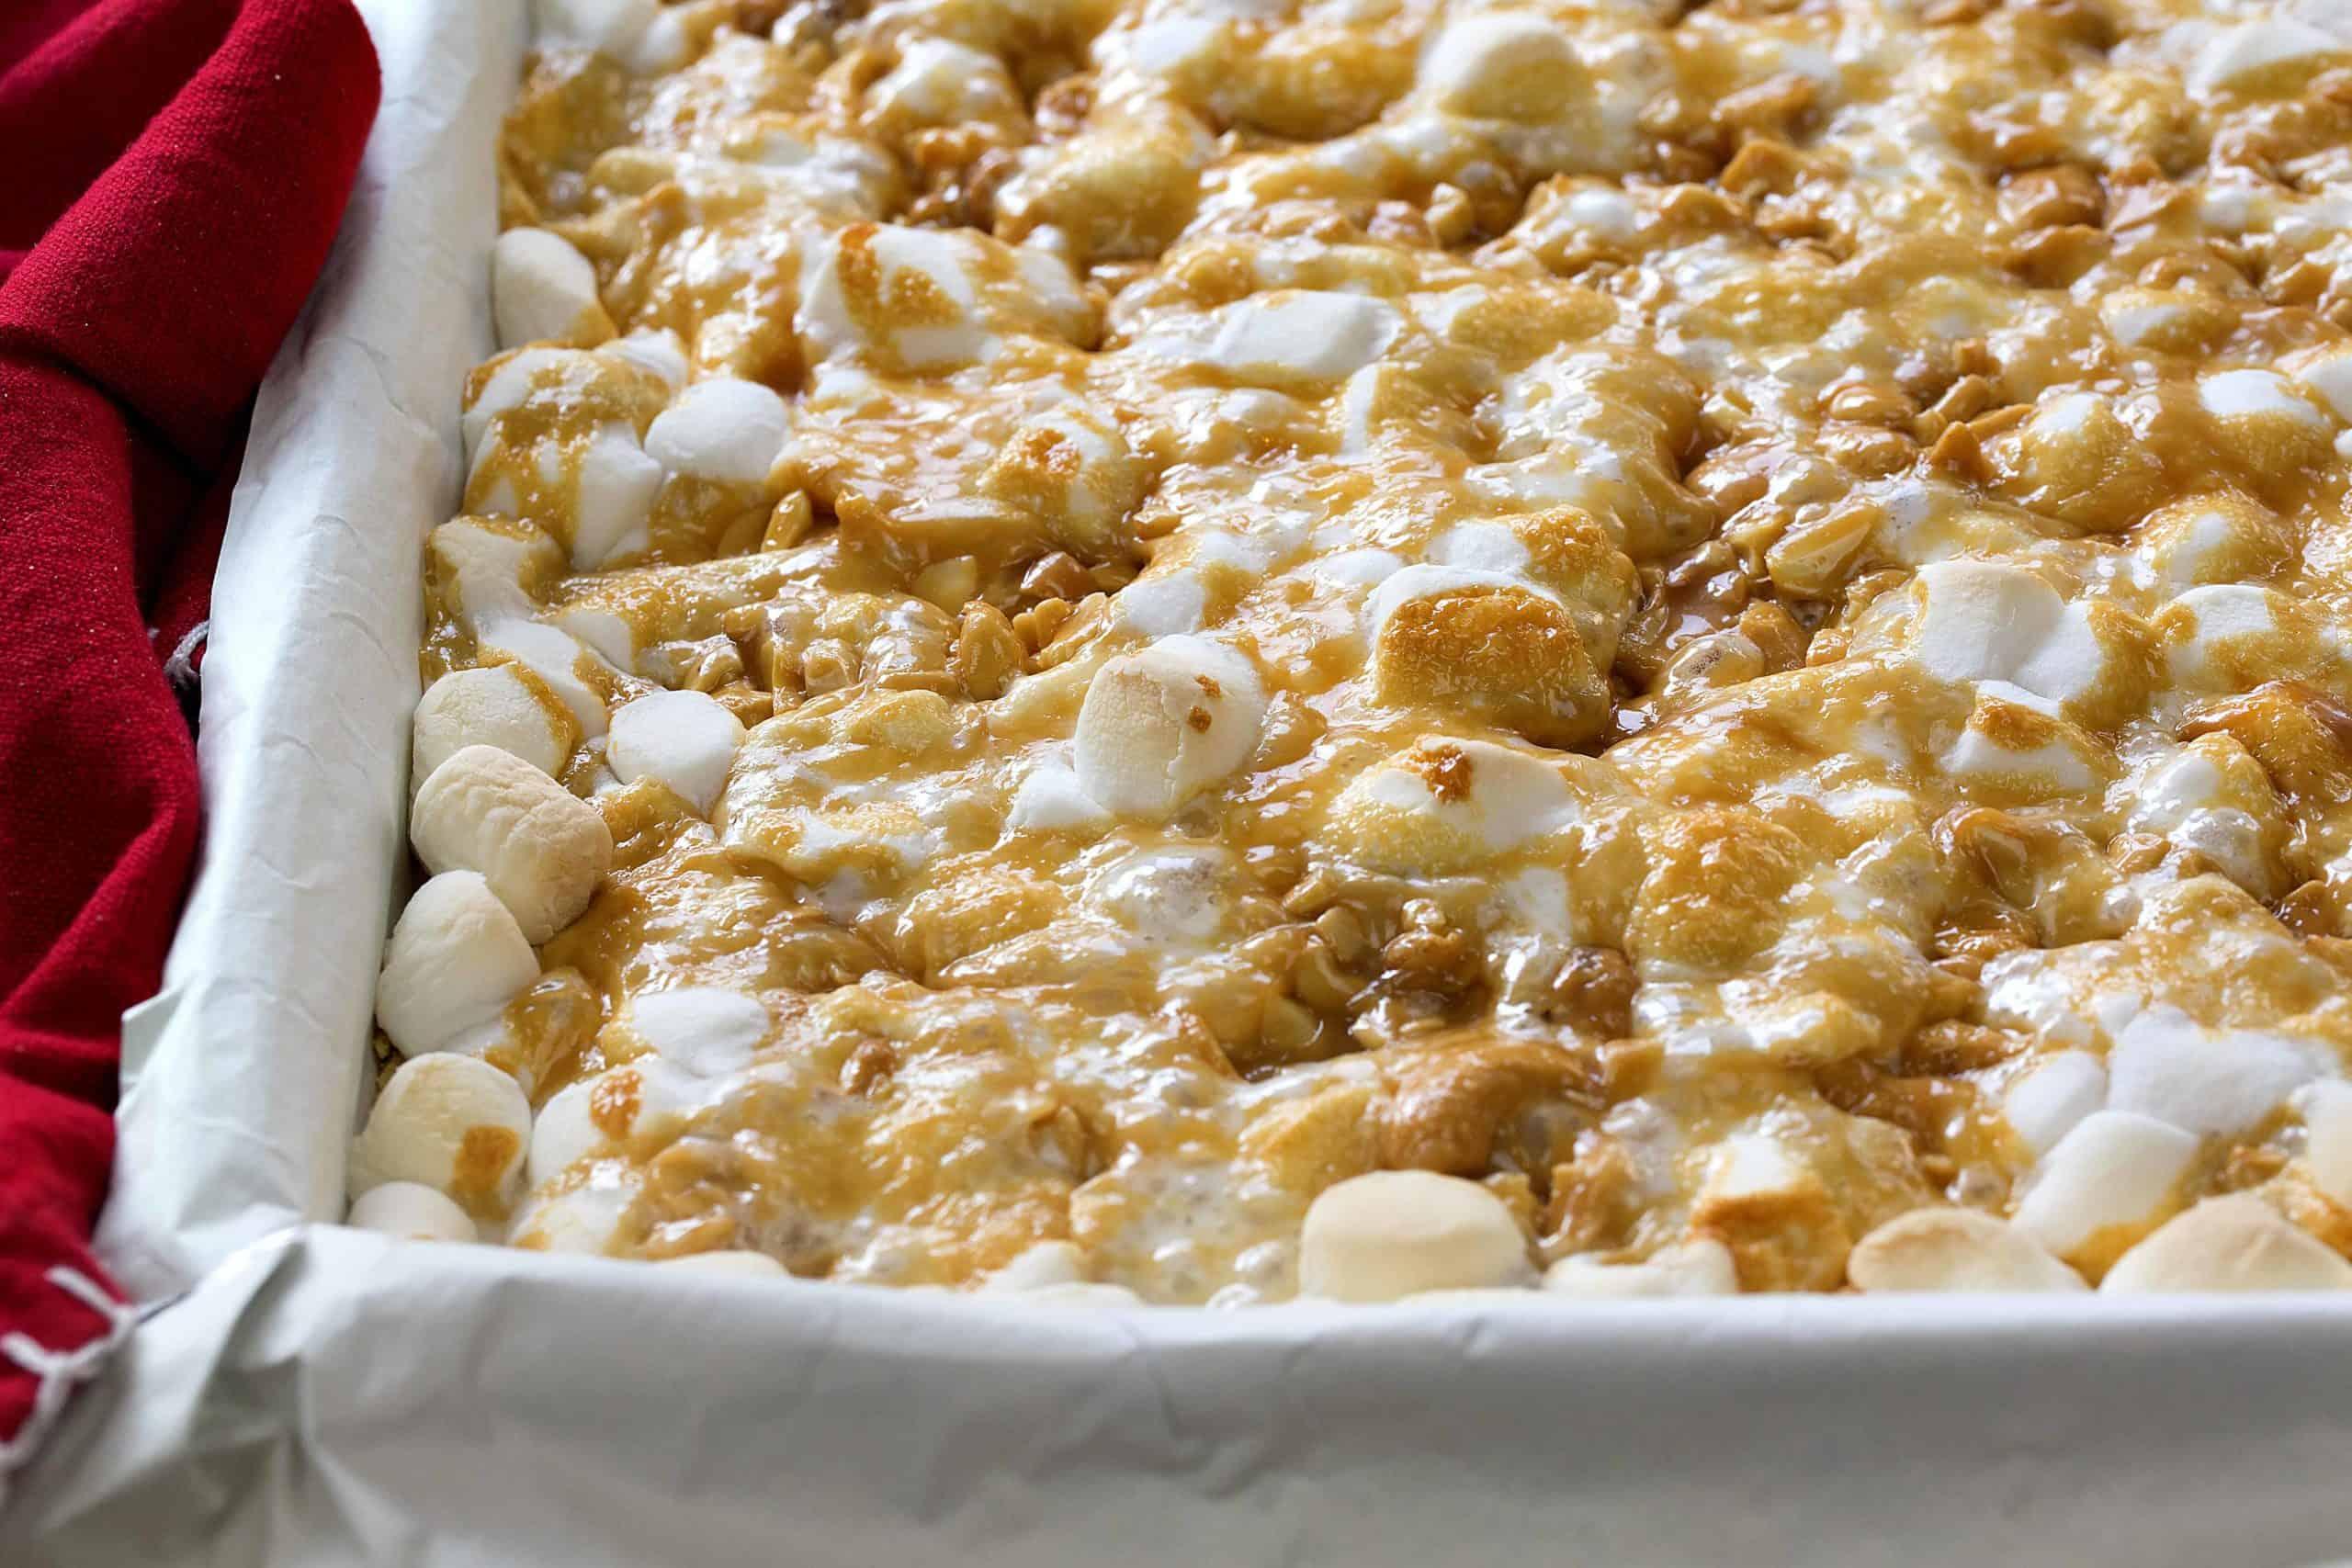 Caramel Cashew Bars Recipe